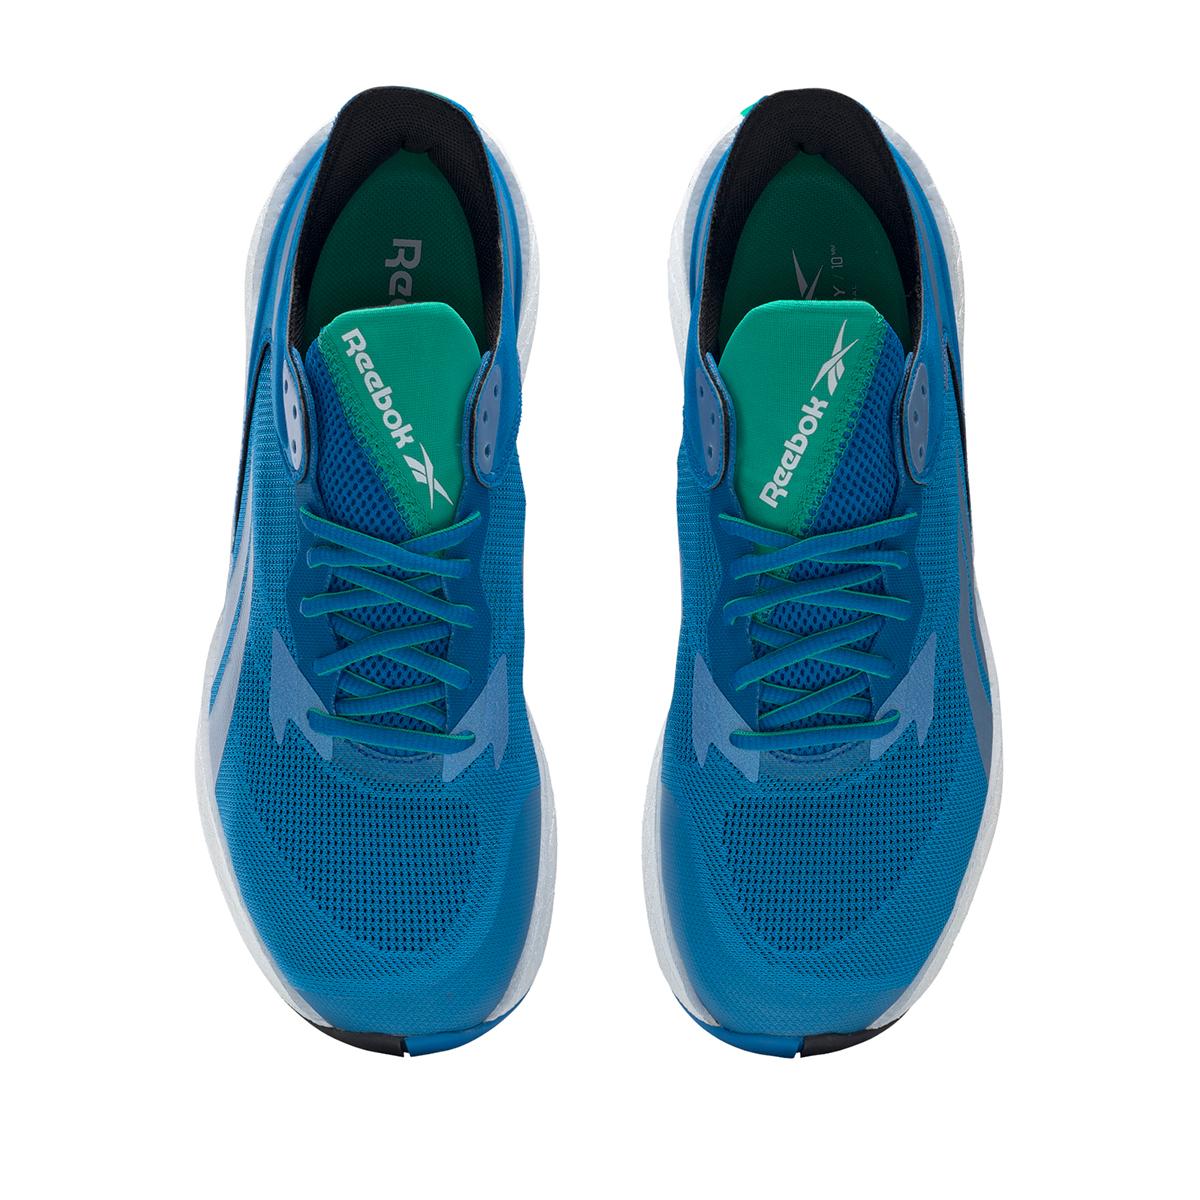 Men's Reebok Floatride Energy Symmetros Running Shoe - Color: Dynamic Blue/Horizon Blue/Court Green - Size: 7 - Width: Regular, Dynamic Blue/Horizon Blue/Court Green, large, image 5